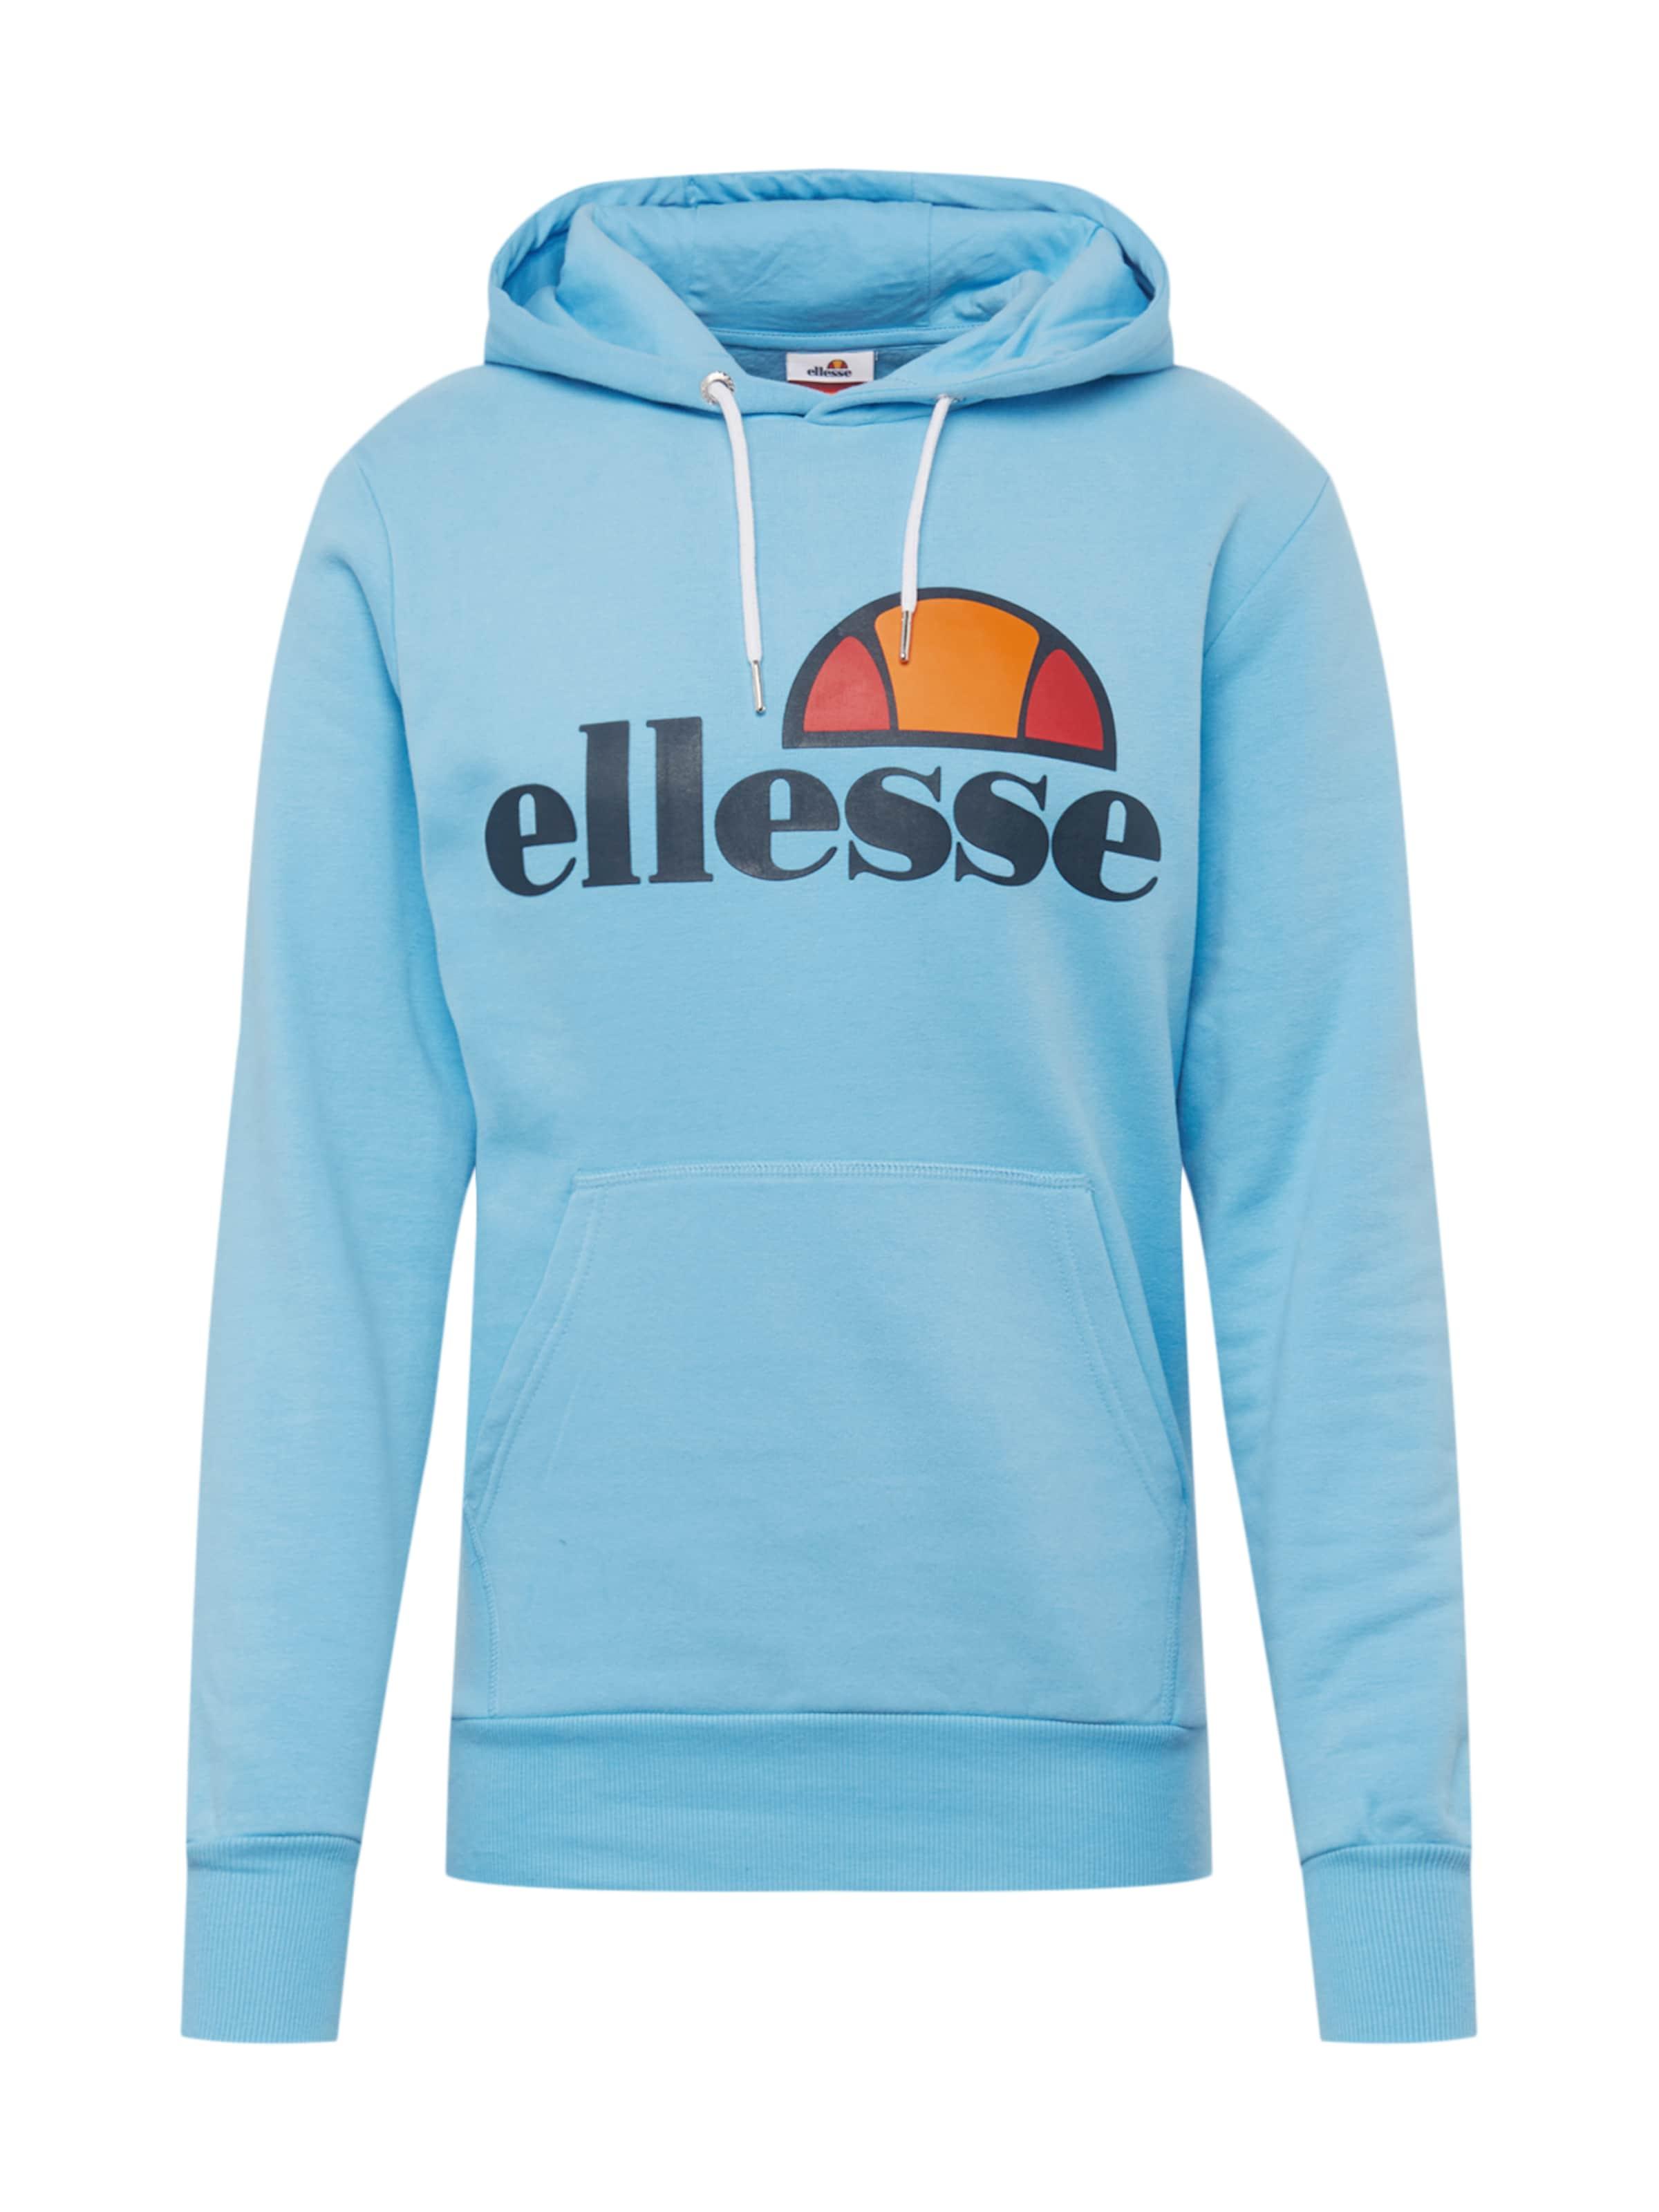 shirt Ellesse Clair Bleu 'gottero' En Sweat BroeECQdWx